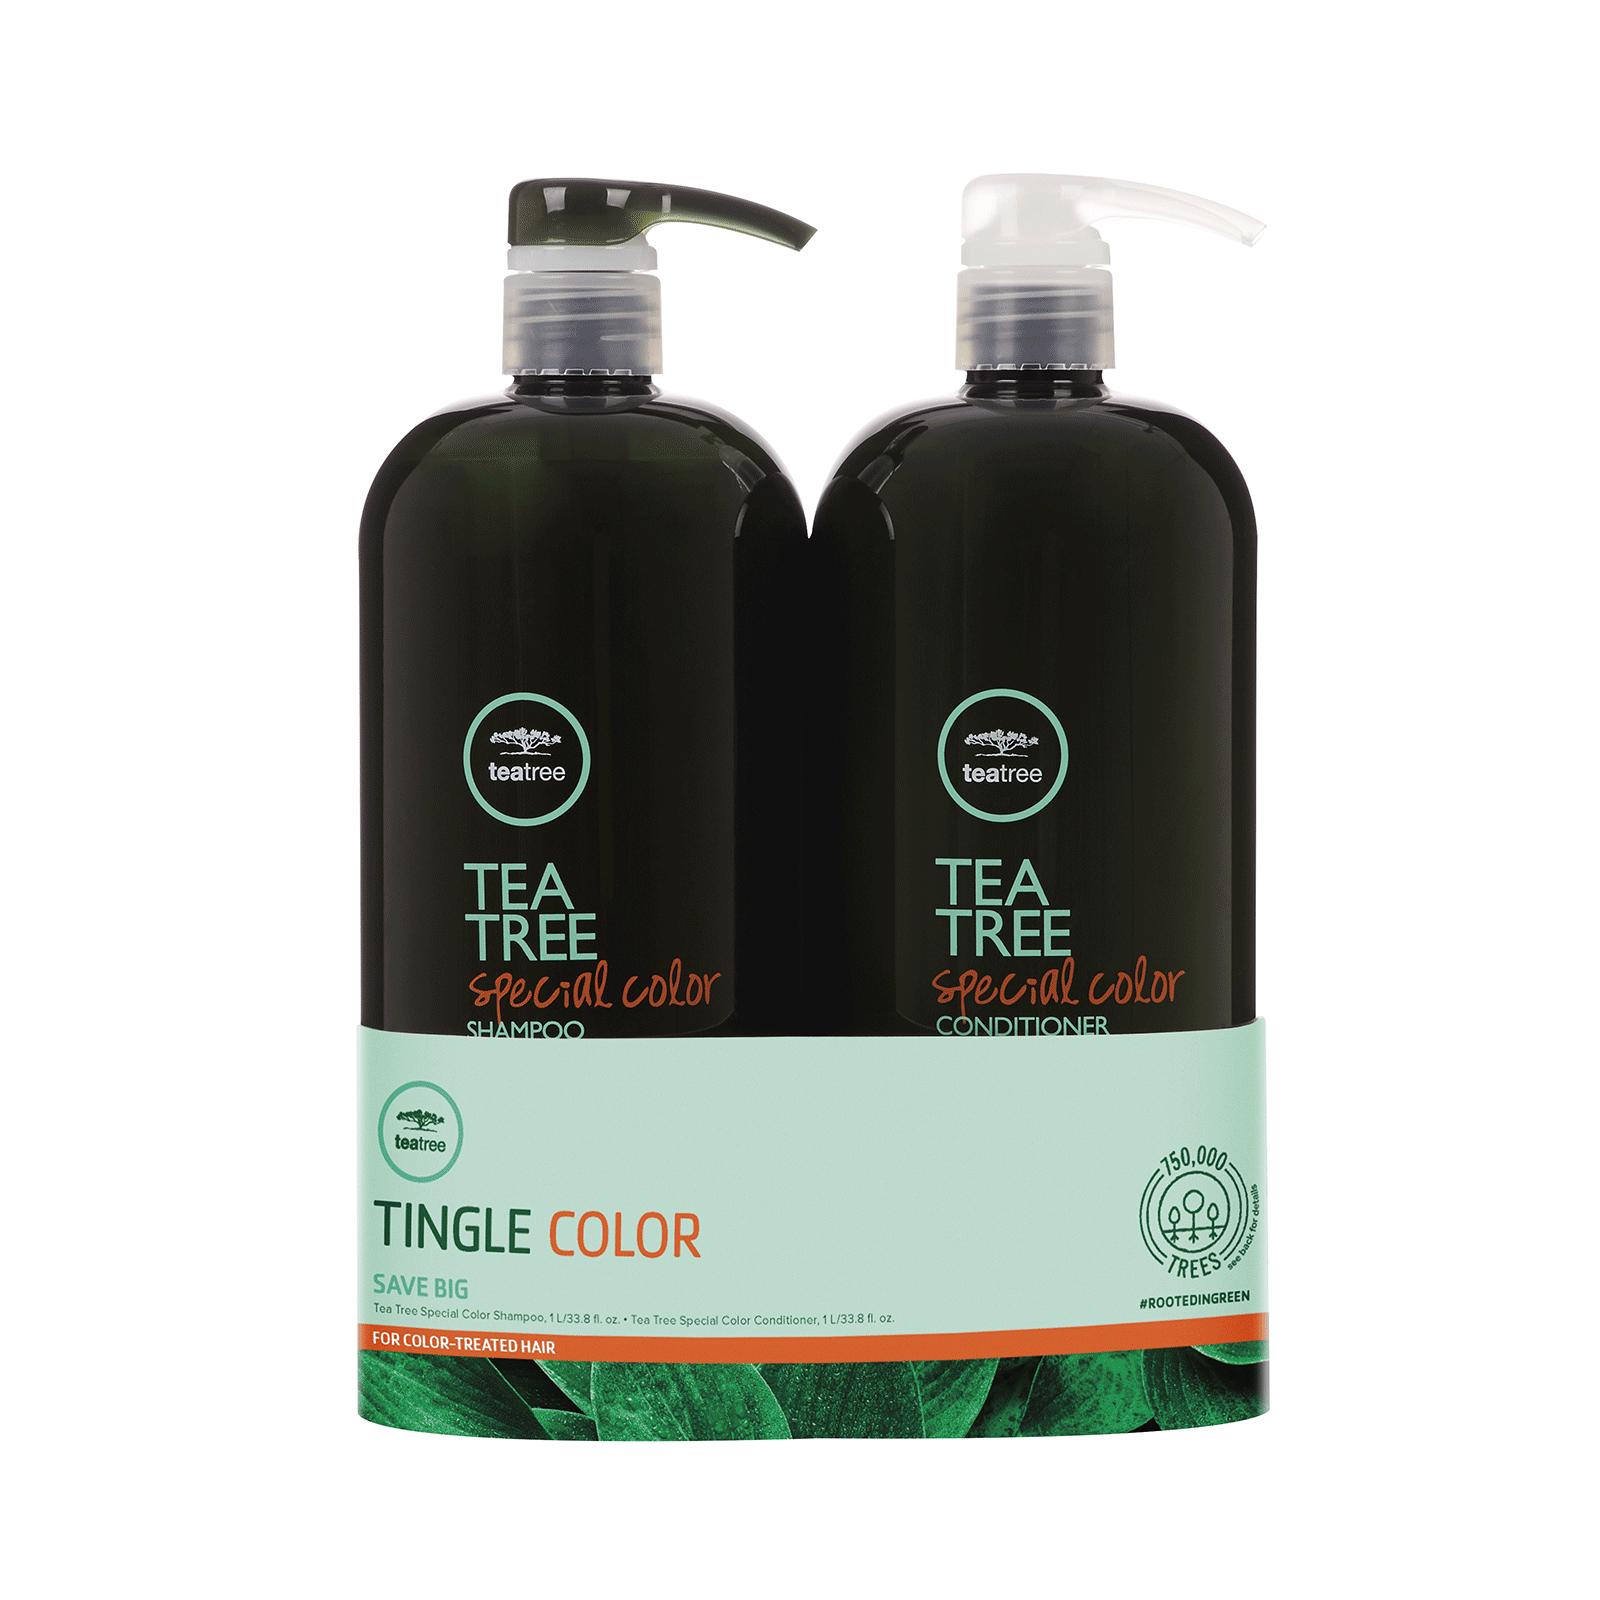 Paul Mitchell Tee Baum Spezial Farbe Shampoo, Haarspülung Liter Duo